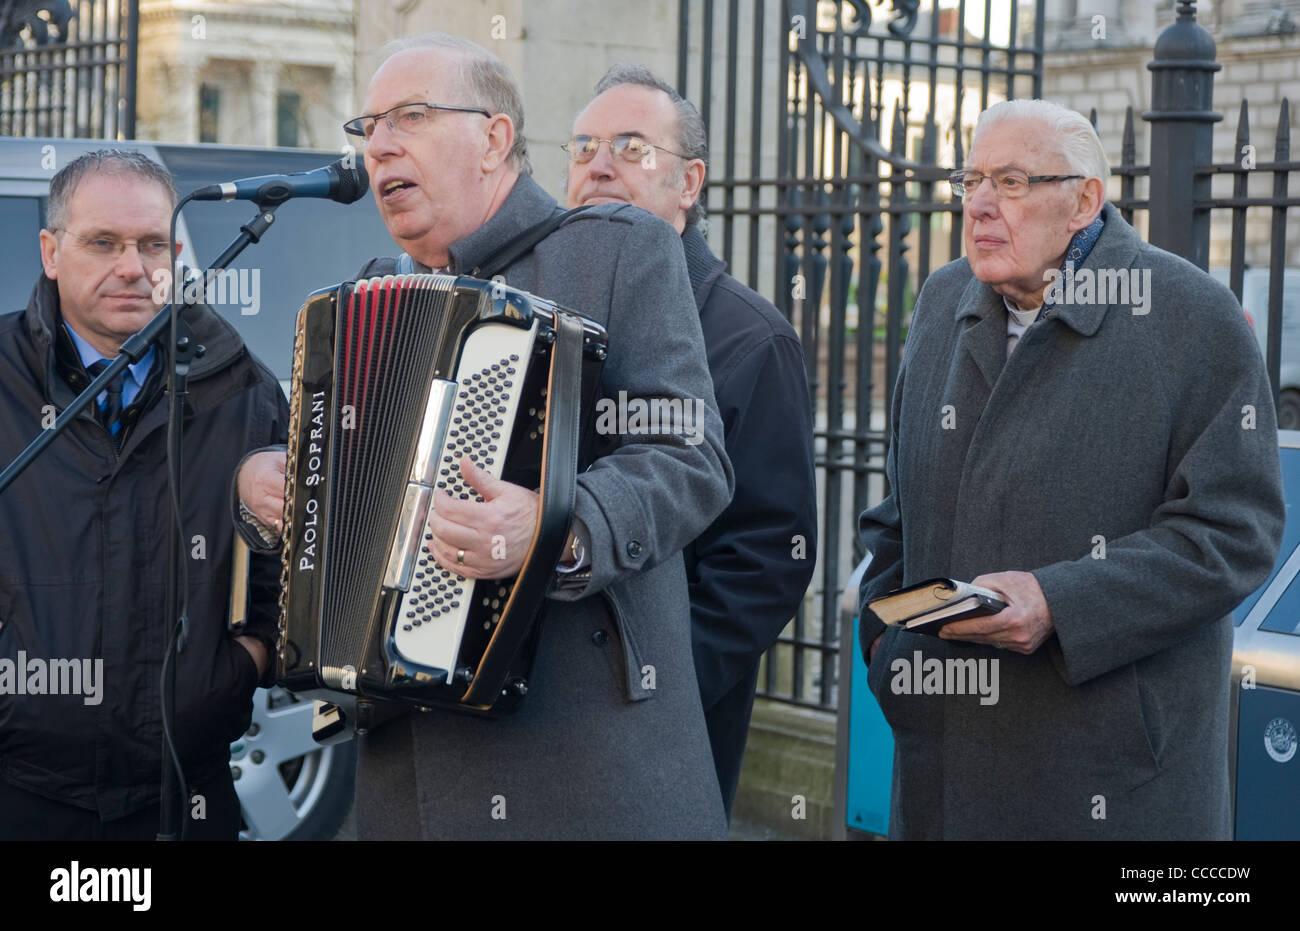 Reverend Ian Paisley at Belfast City Hall - Stock Image